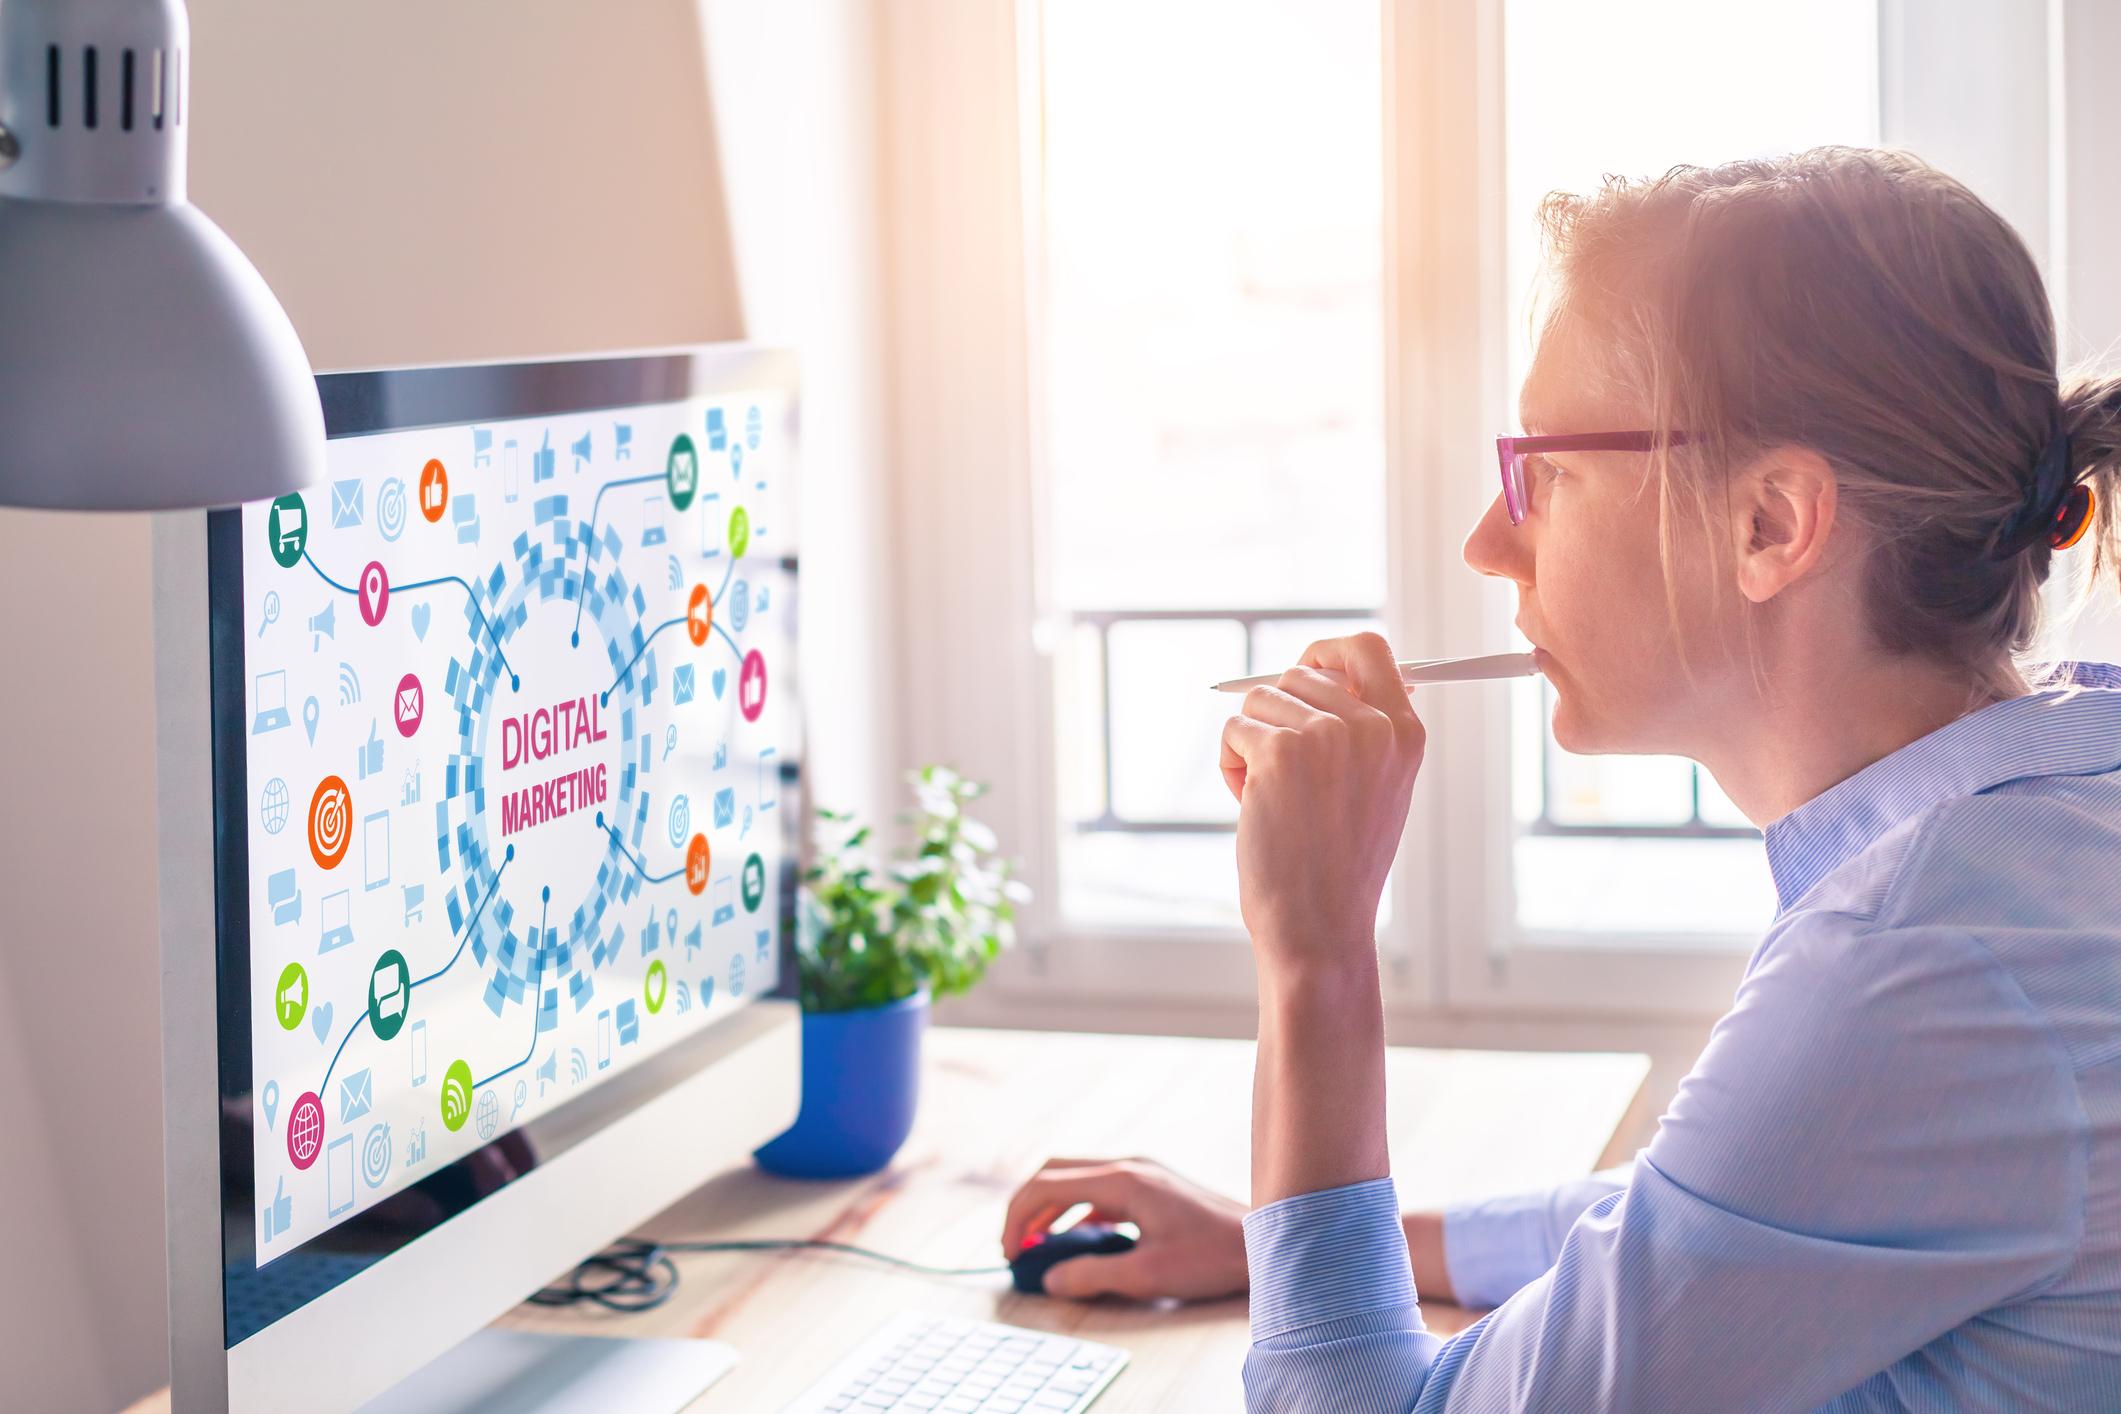 A marketing professional reviews a digital marketing campaign.